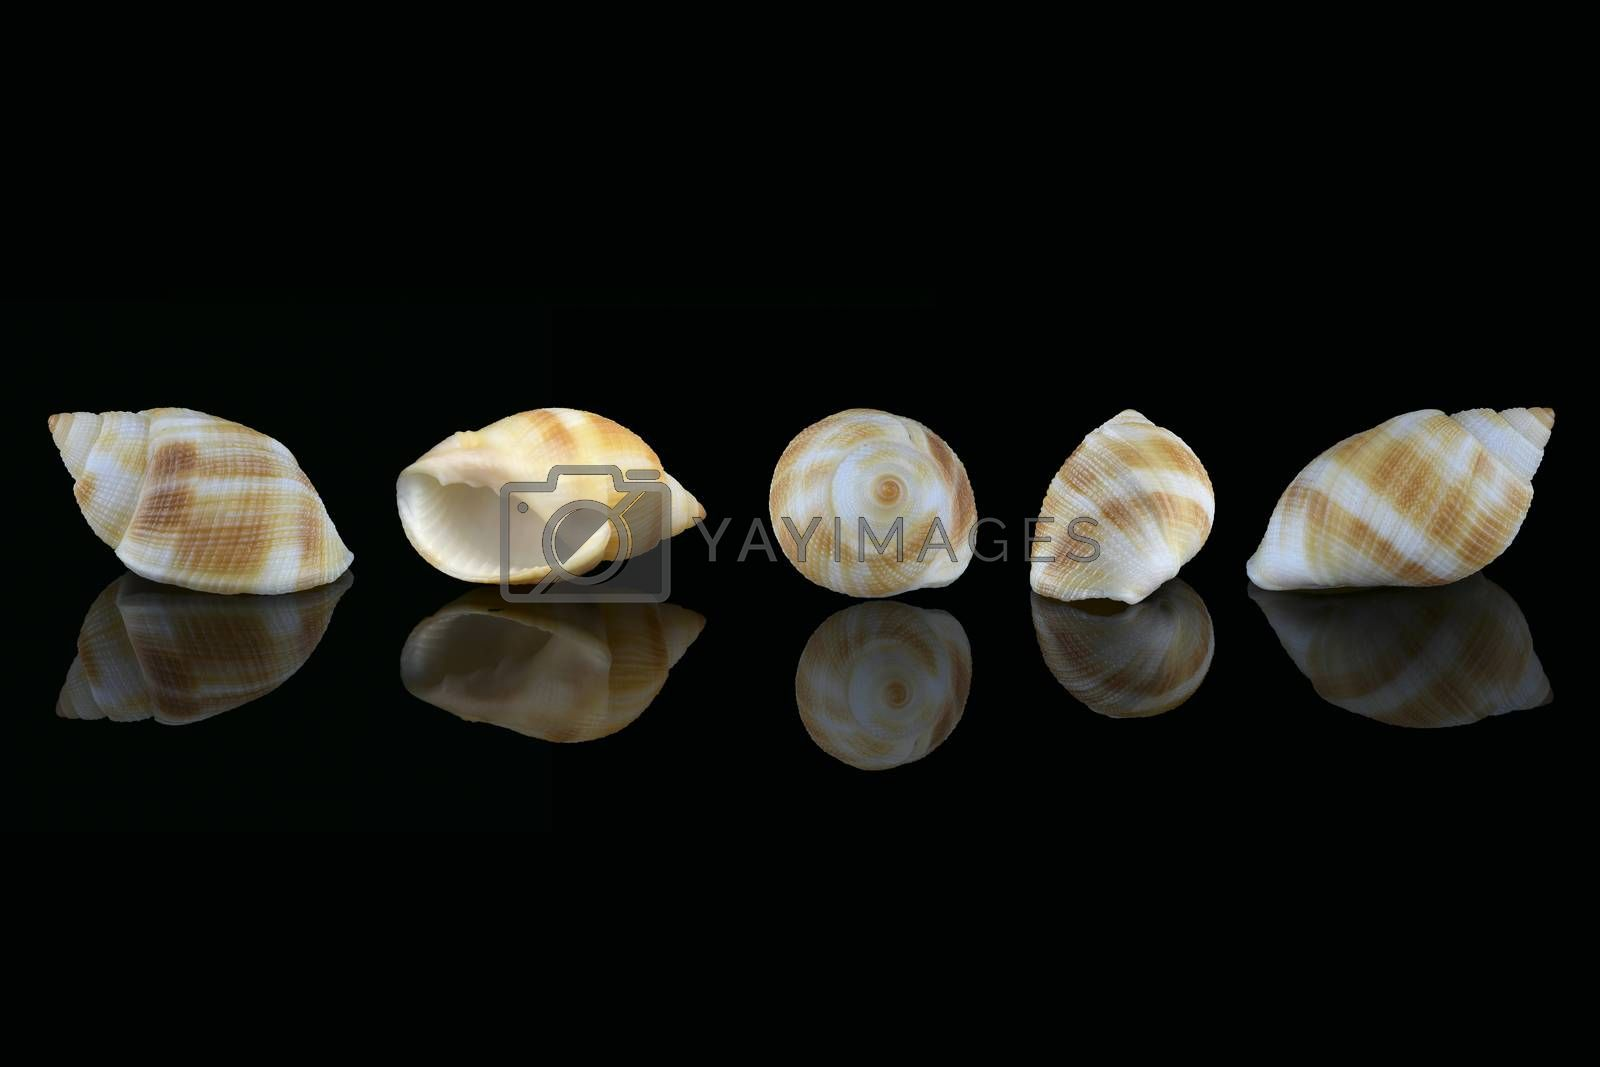 Royalty free image of Nassarius seashell, Dubai, UAE by GABIS